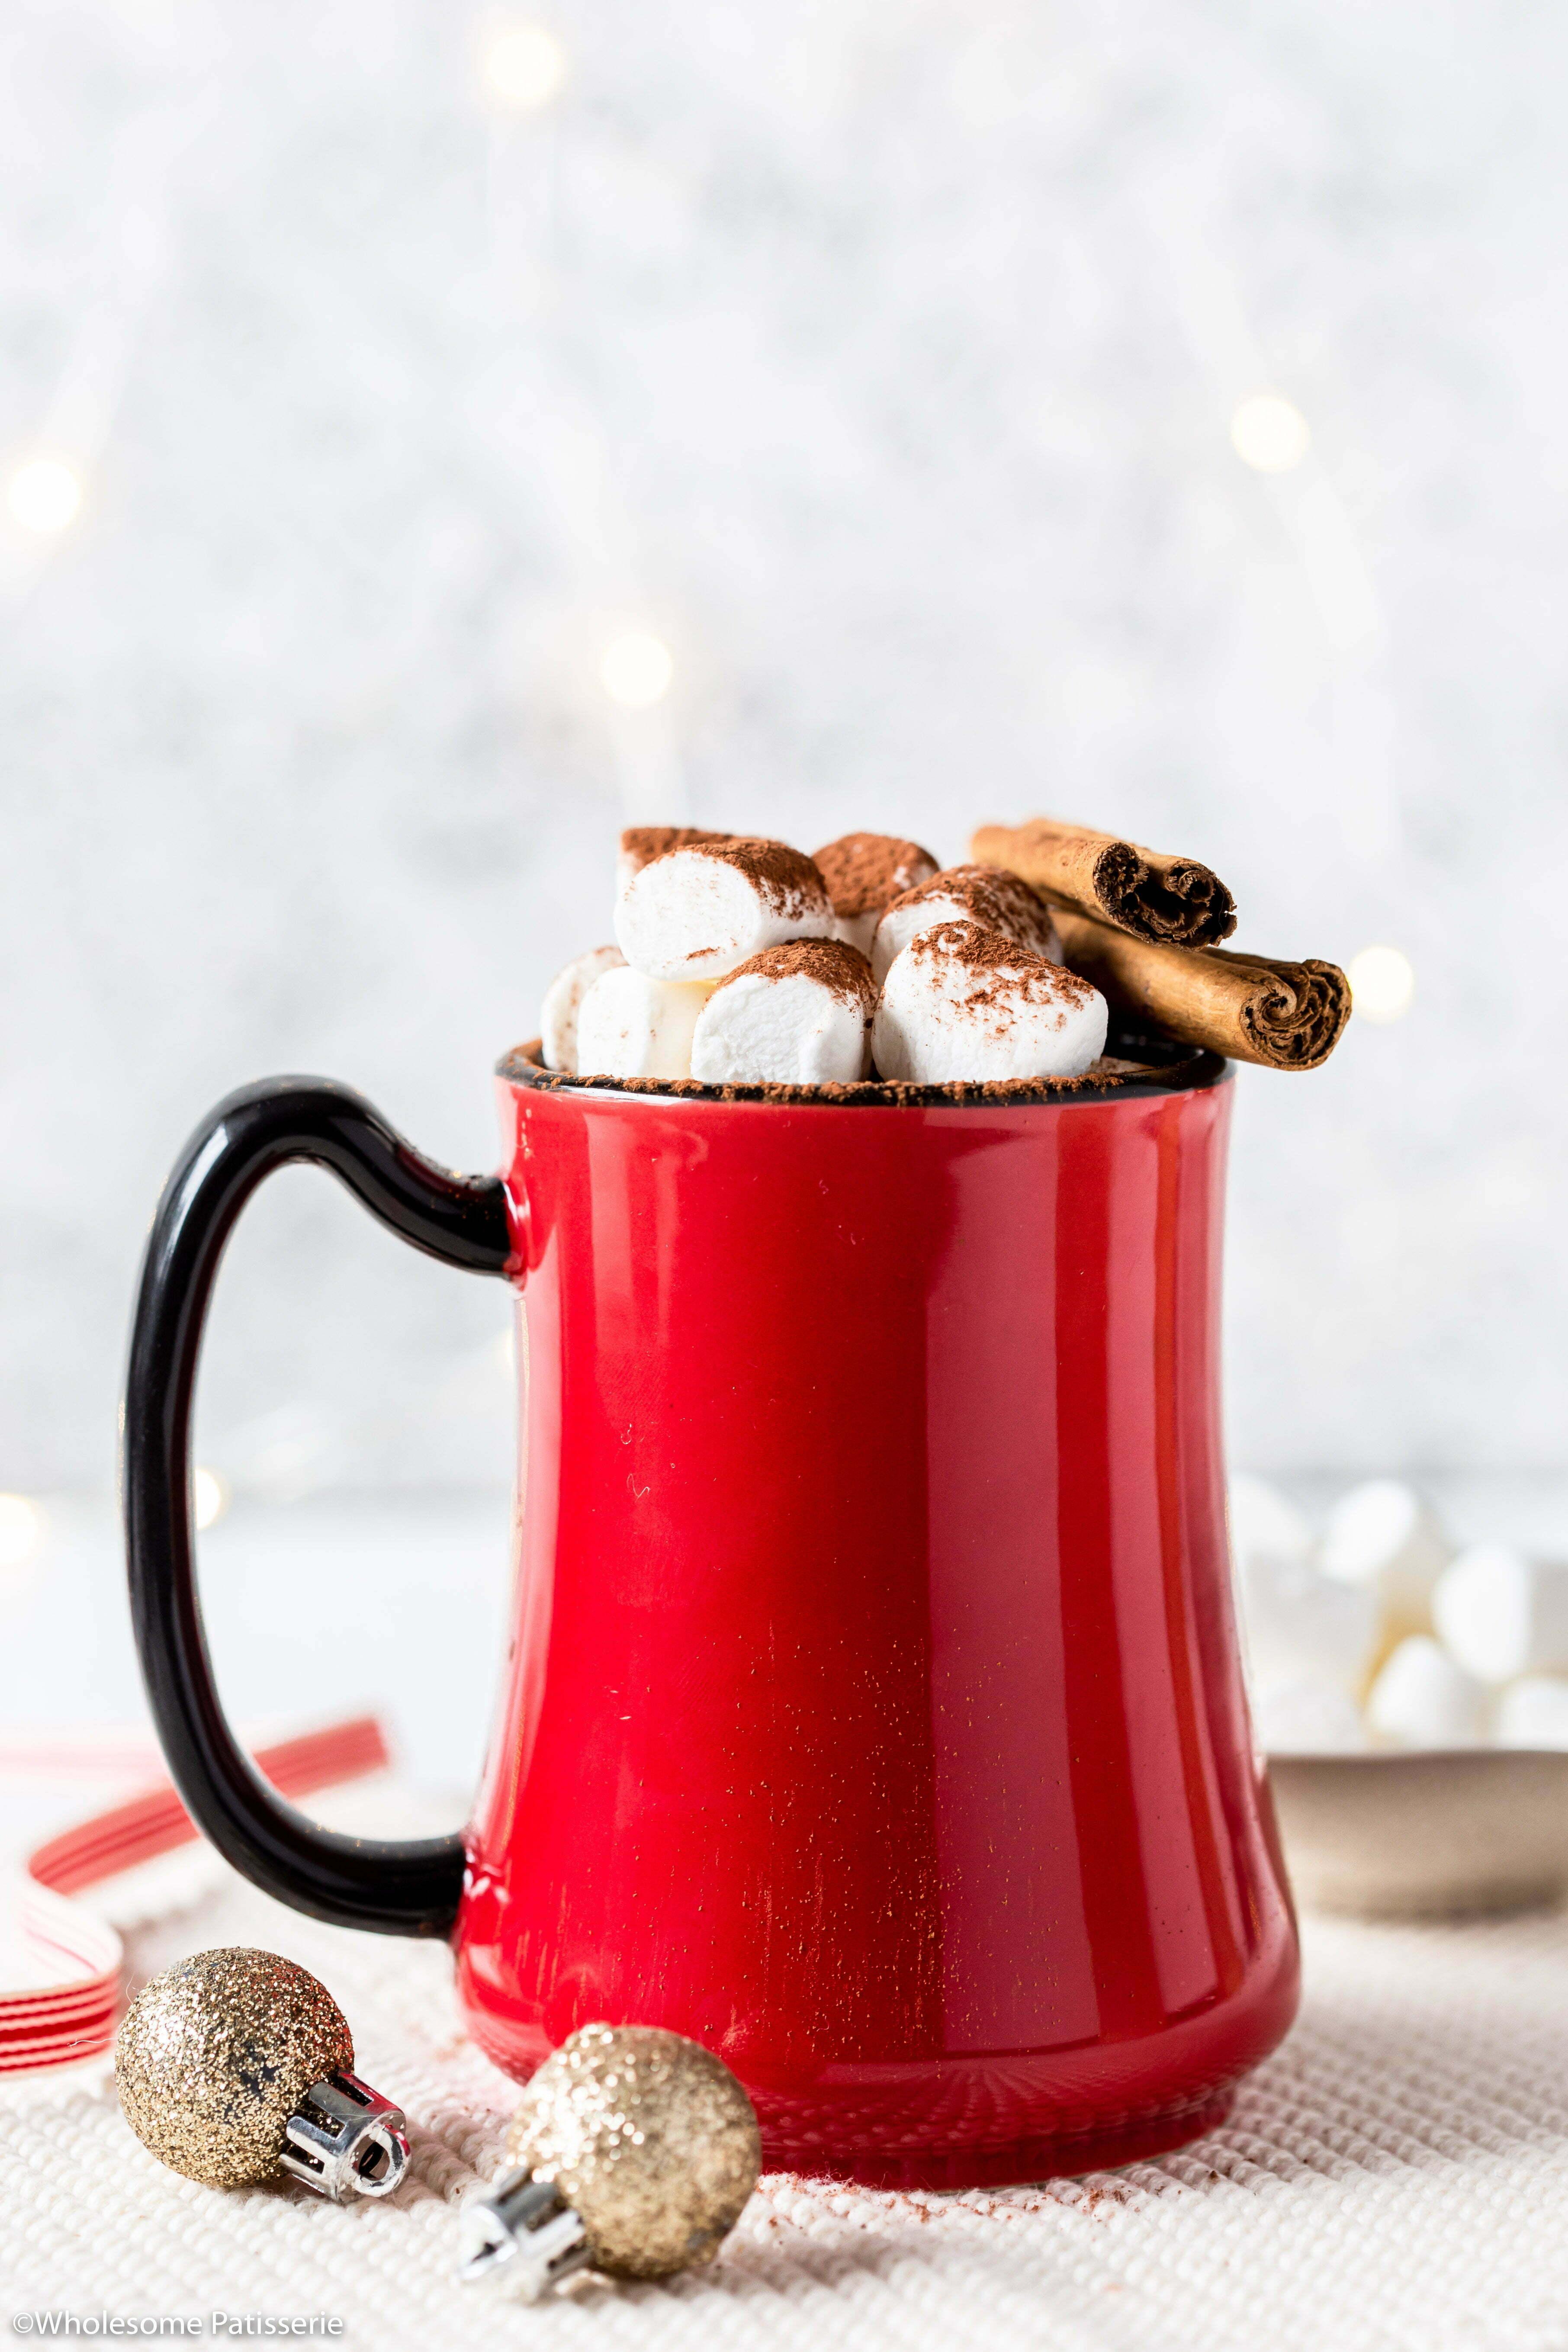 Peppermint & Cinnamon Hot Cocoa